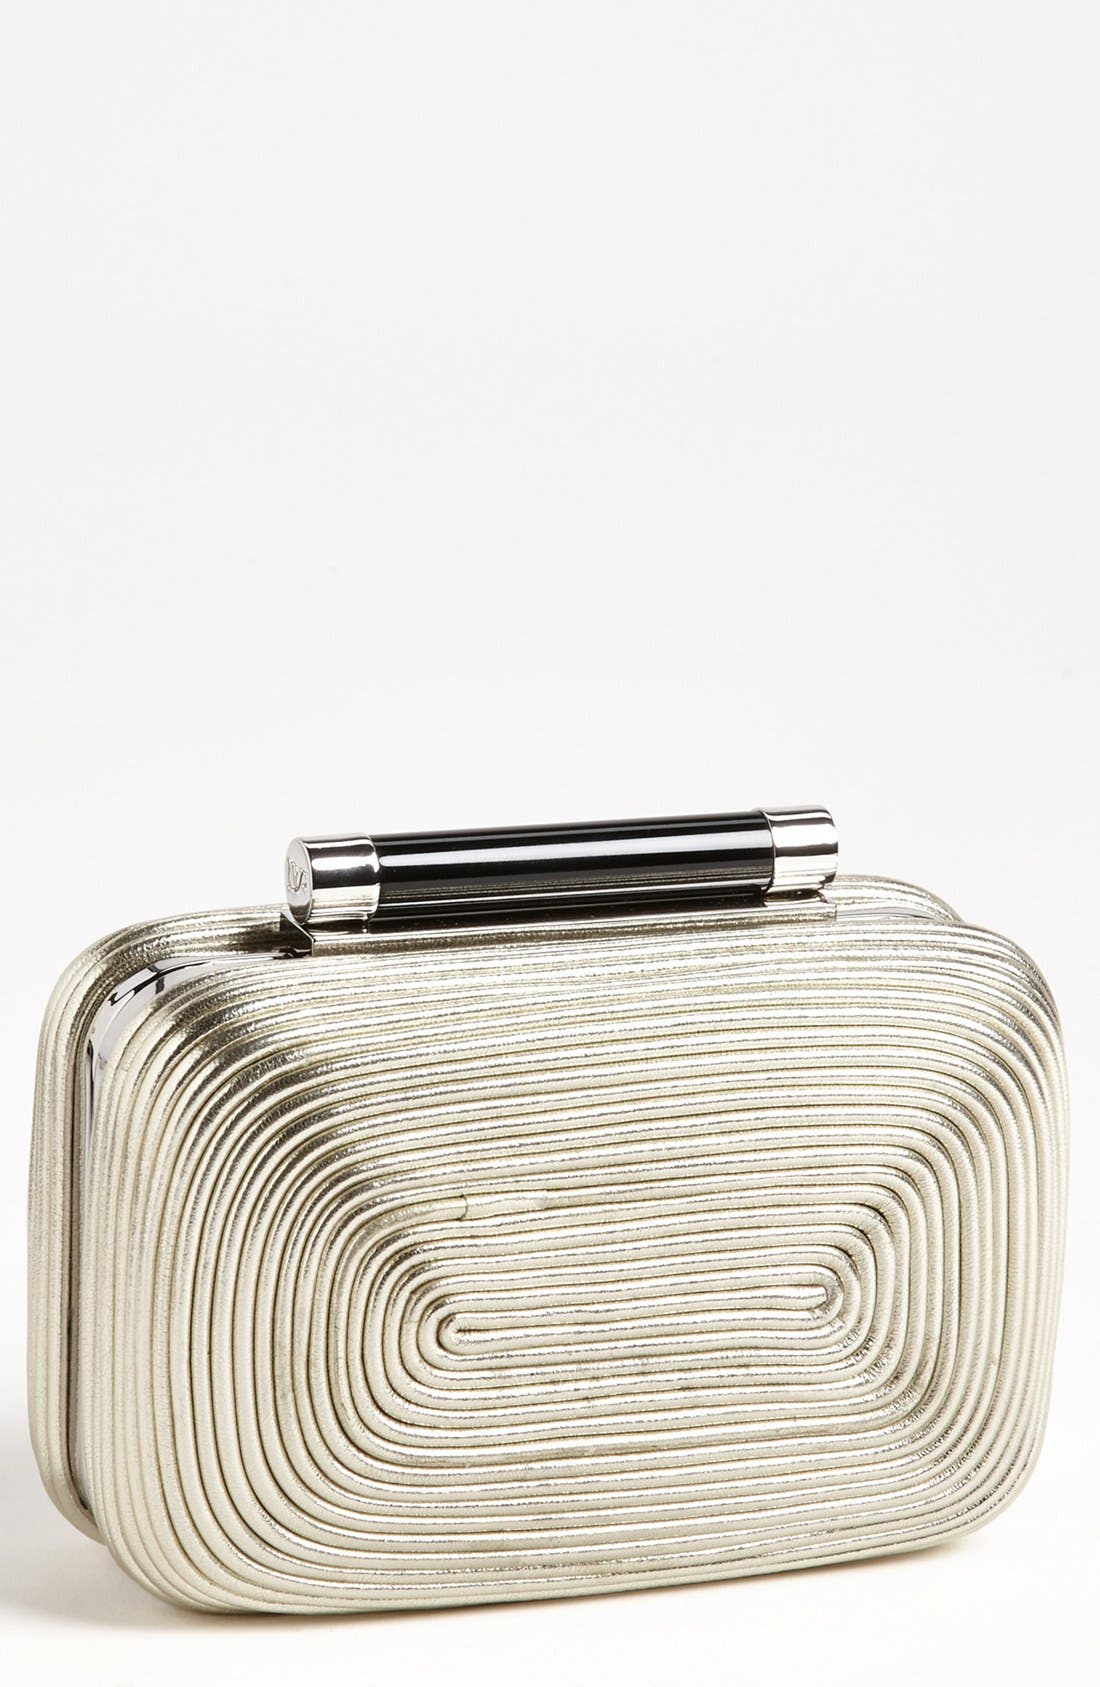 Alternate Image 1 Selected - Diane von Furstenberg 'Tonda - Small' Passementerie Metallic Clutch